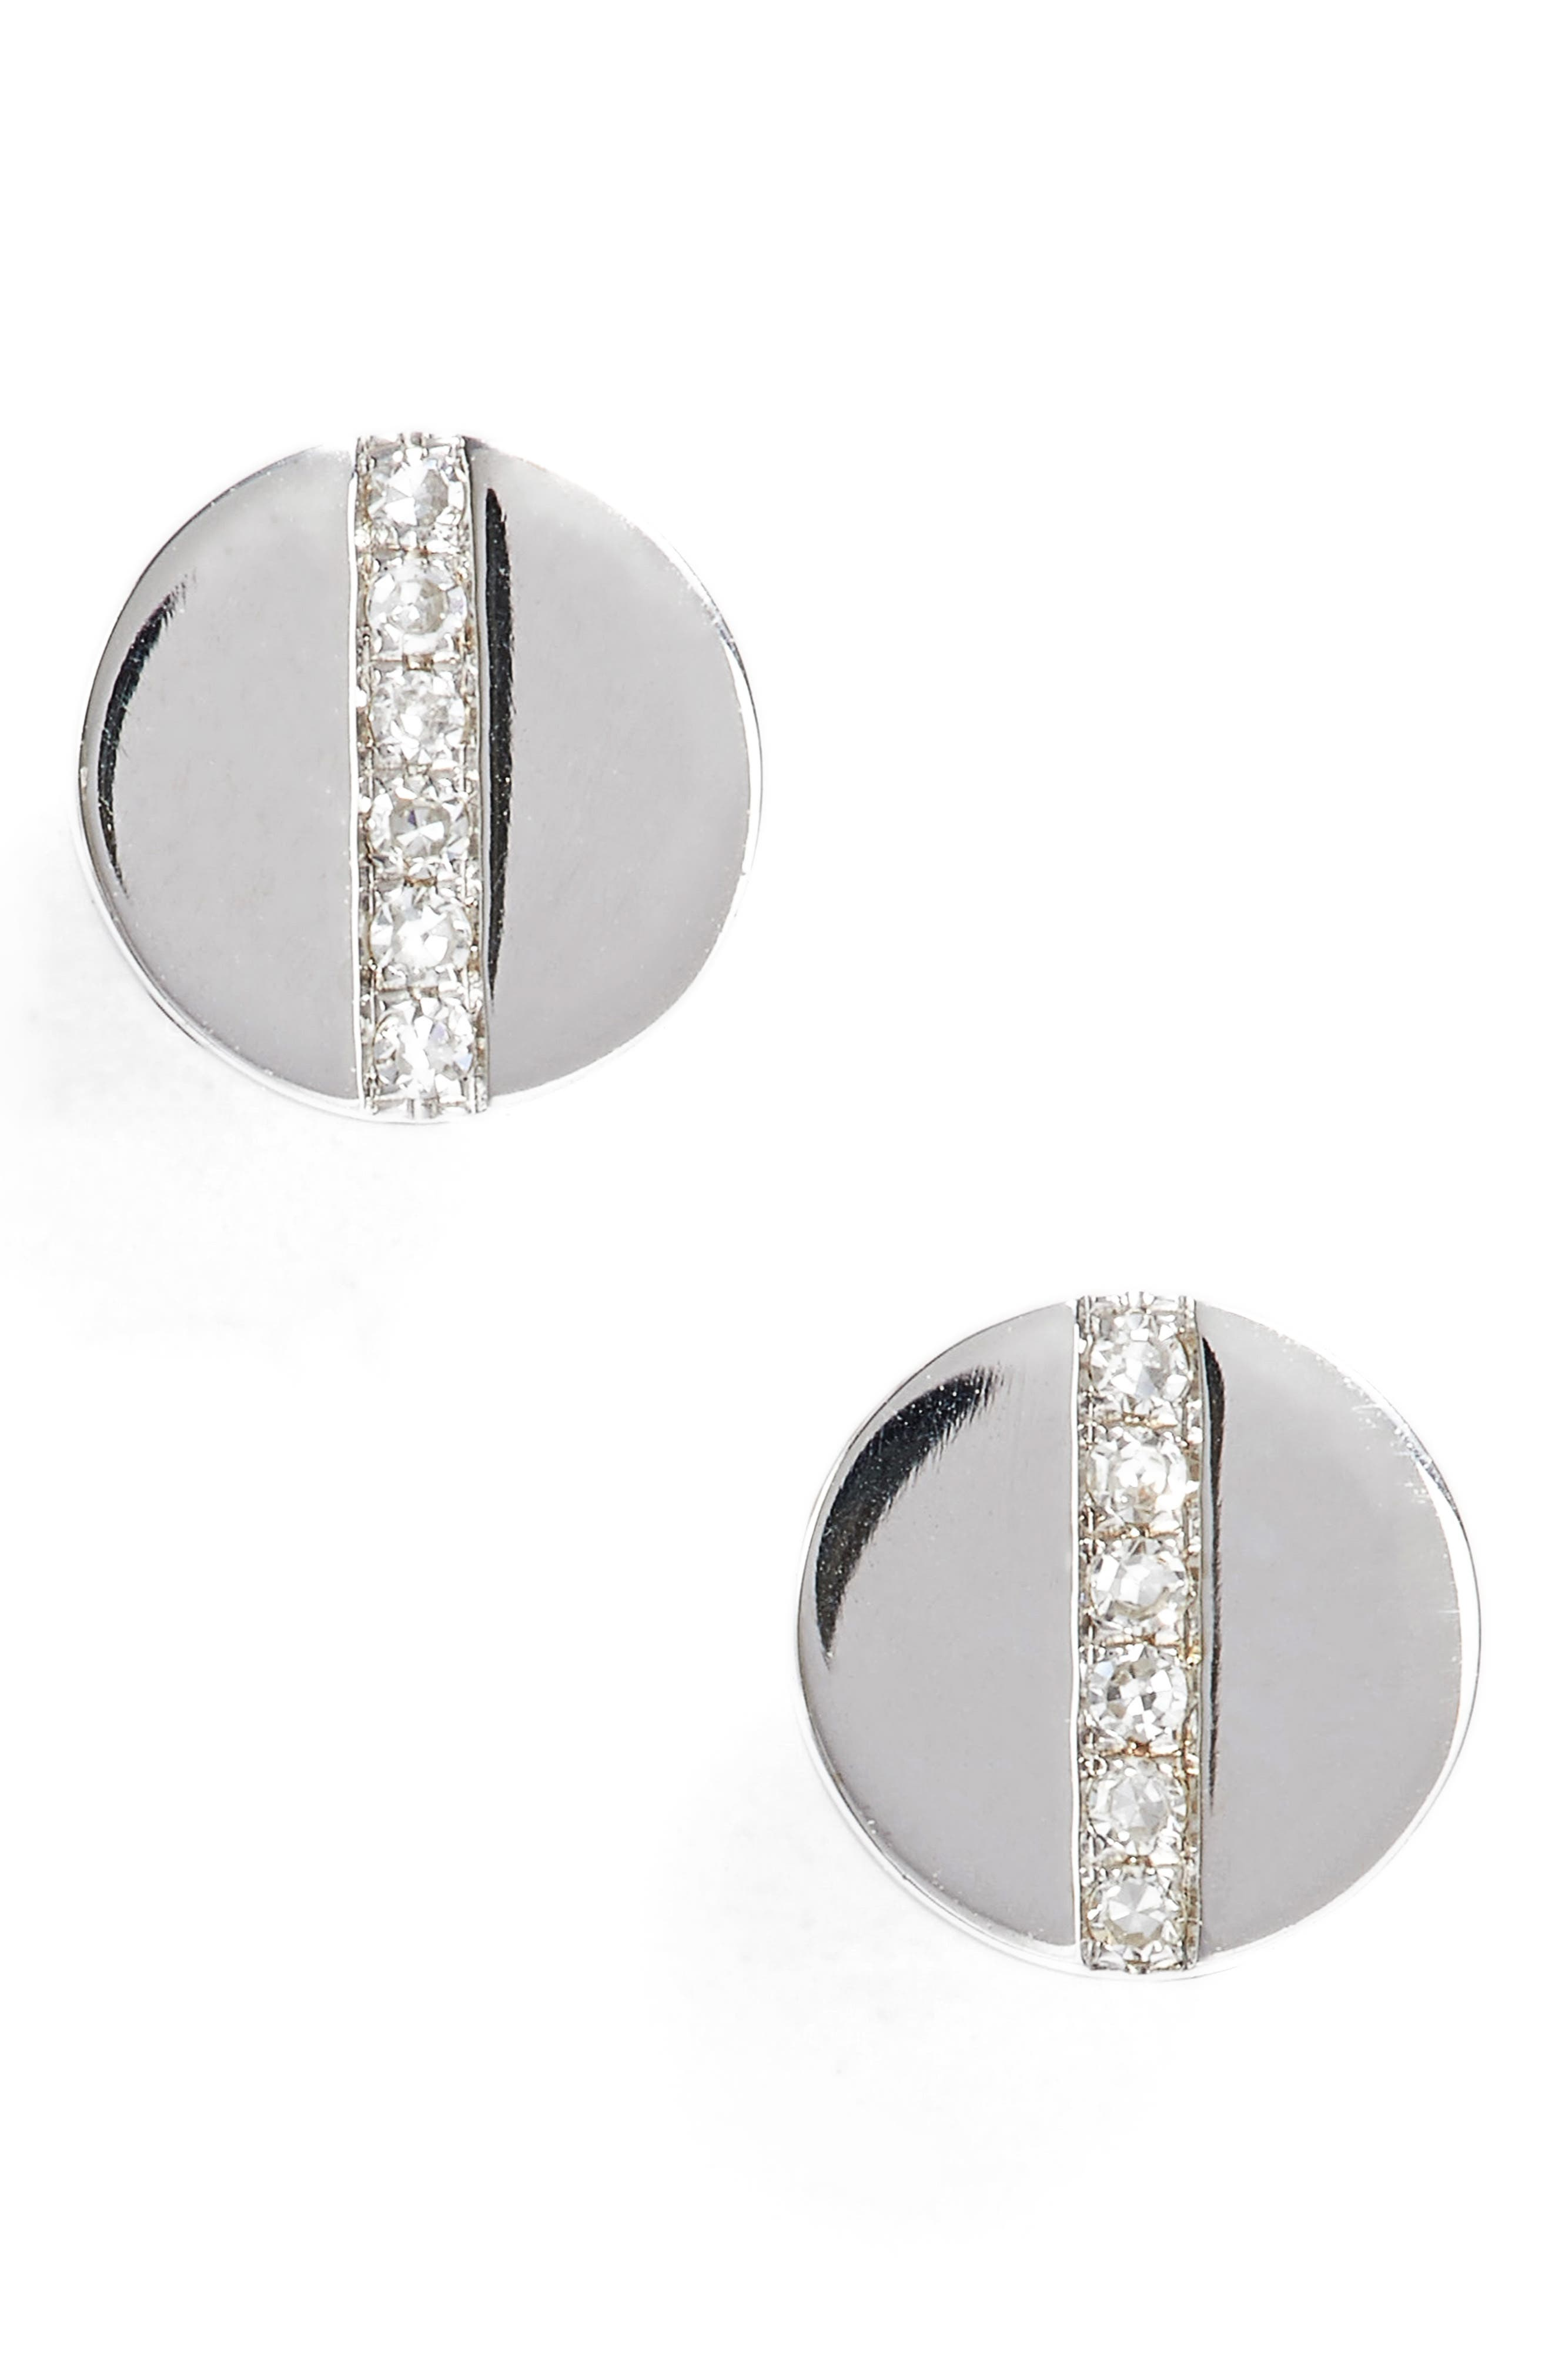 Screw Diamond Stud Earrings,                             Main thumbnail 1, color,                             White Gold